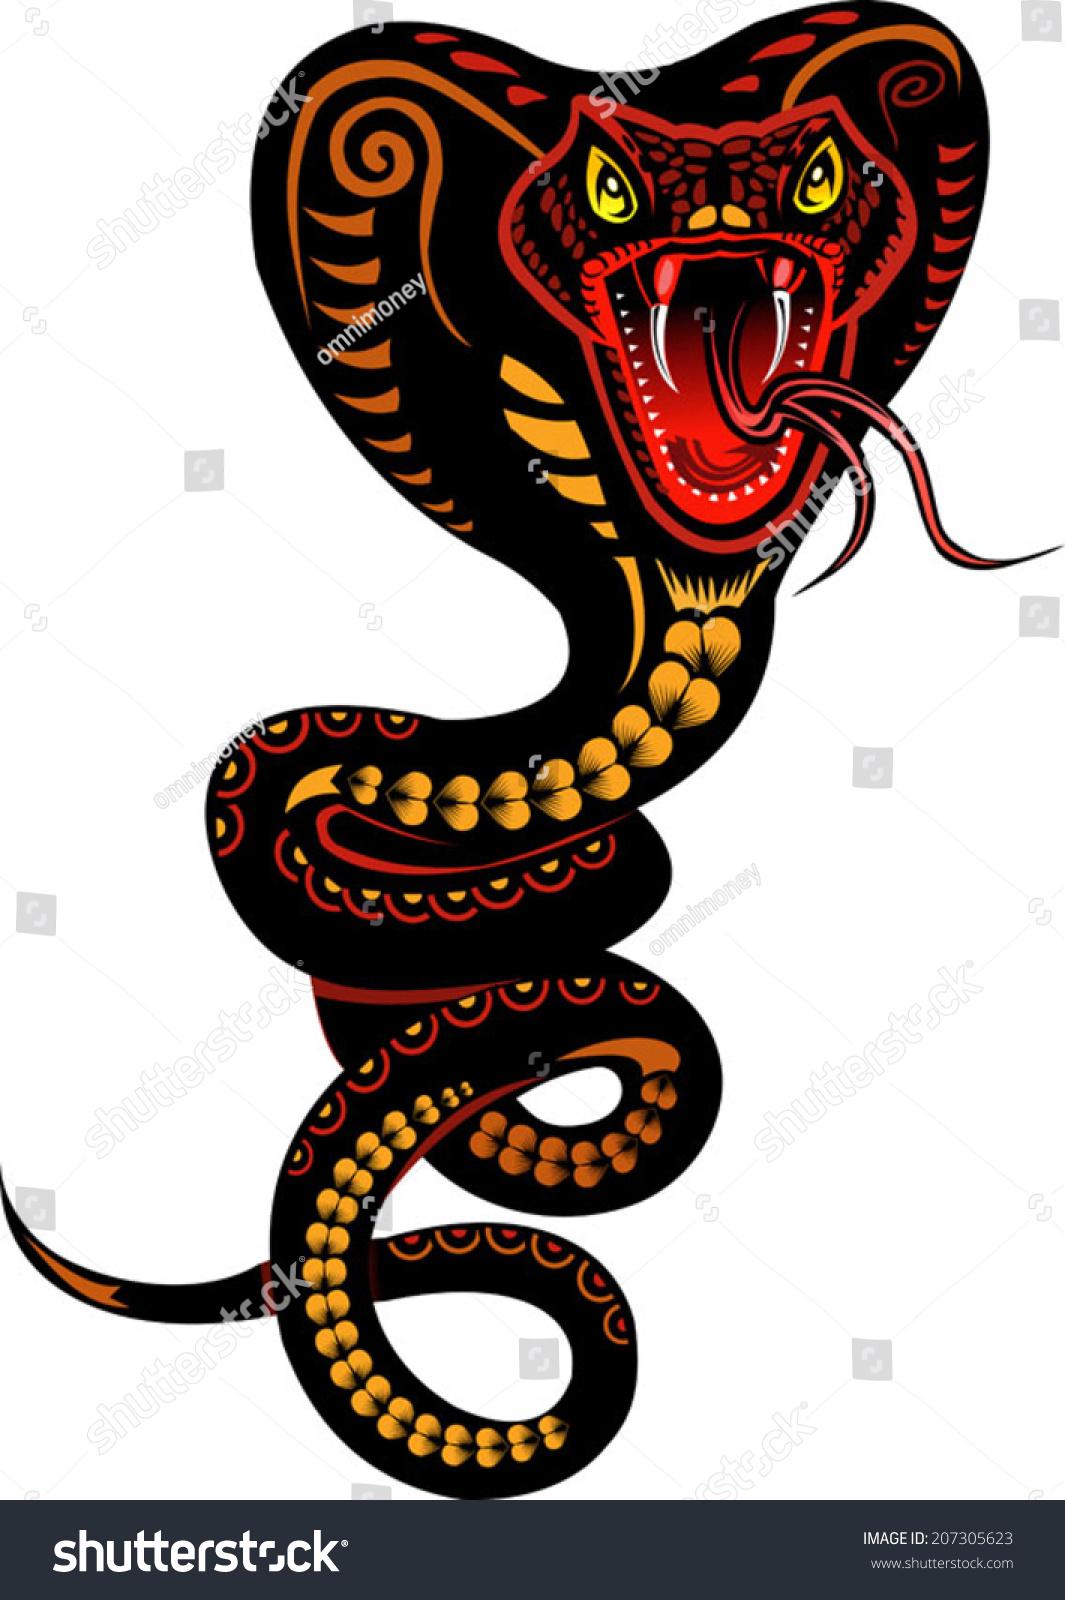 snake tattoo cobra stock vector 207305623 shutterstock. Black Bedroom Furniture Sets. Home Design Ideas